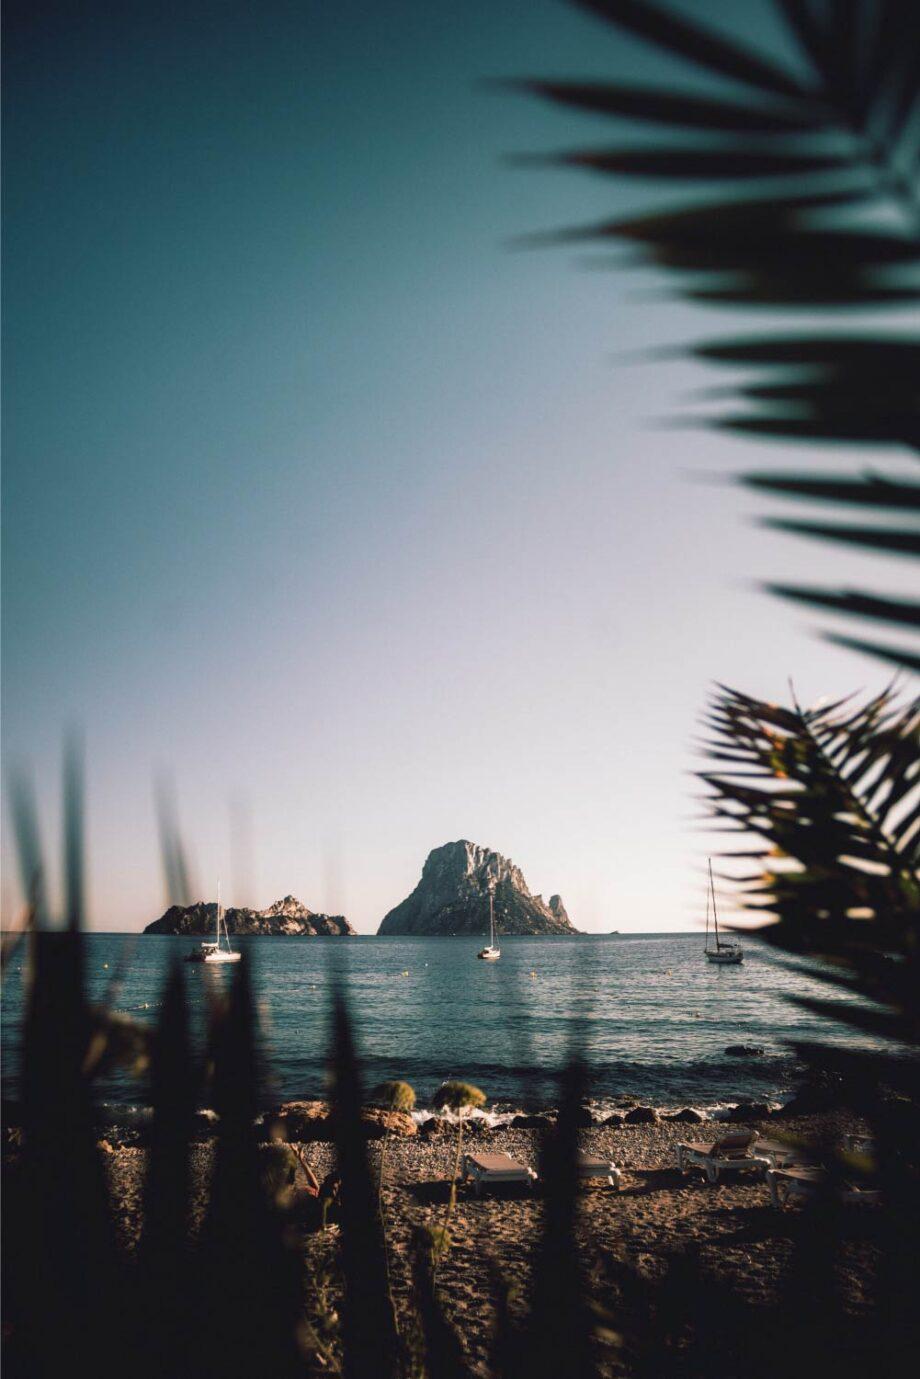 8946004323580_Jose Llamas_Happy island@0.5x-50